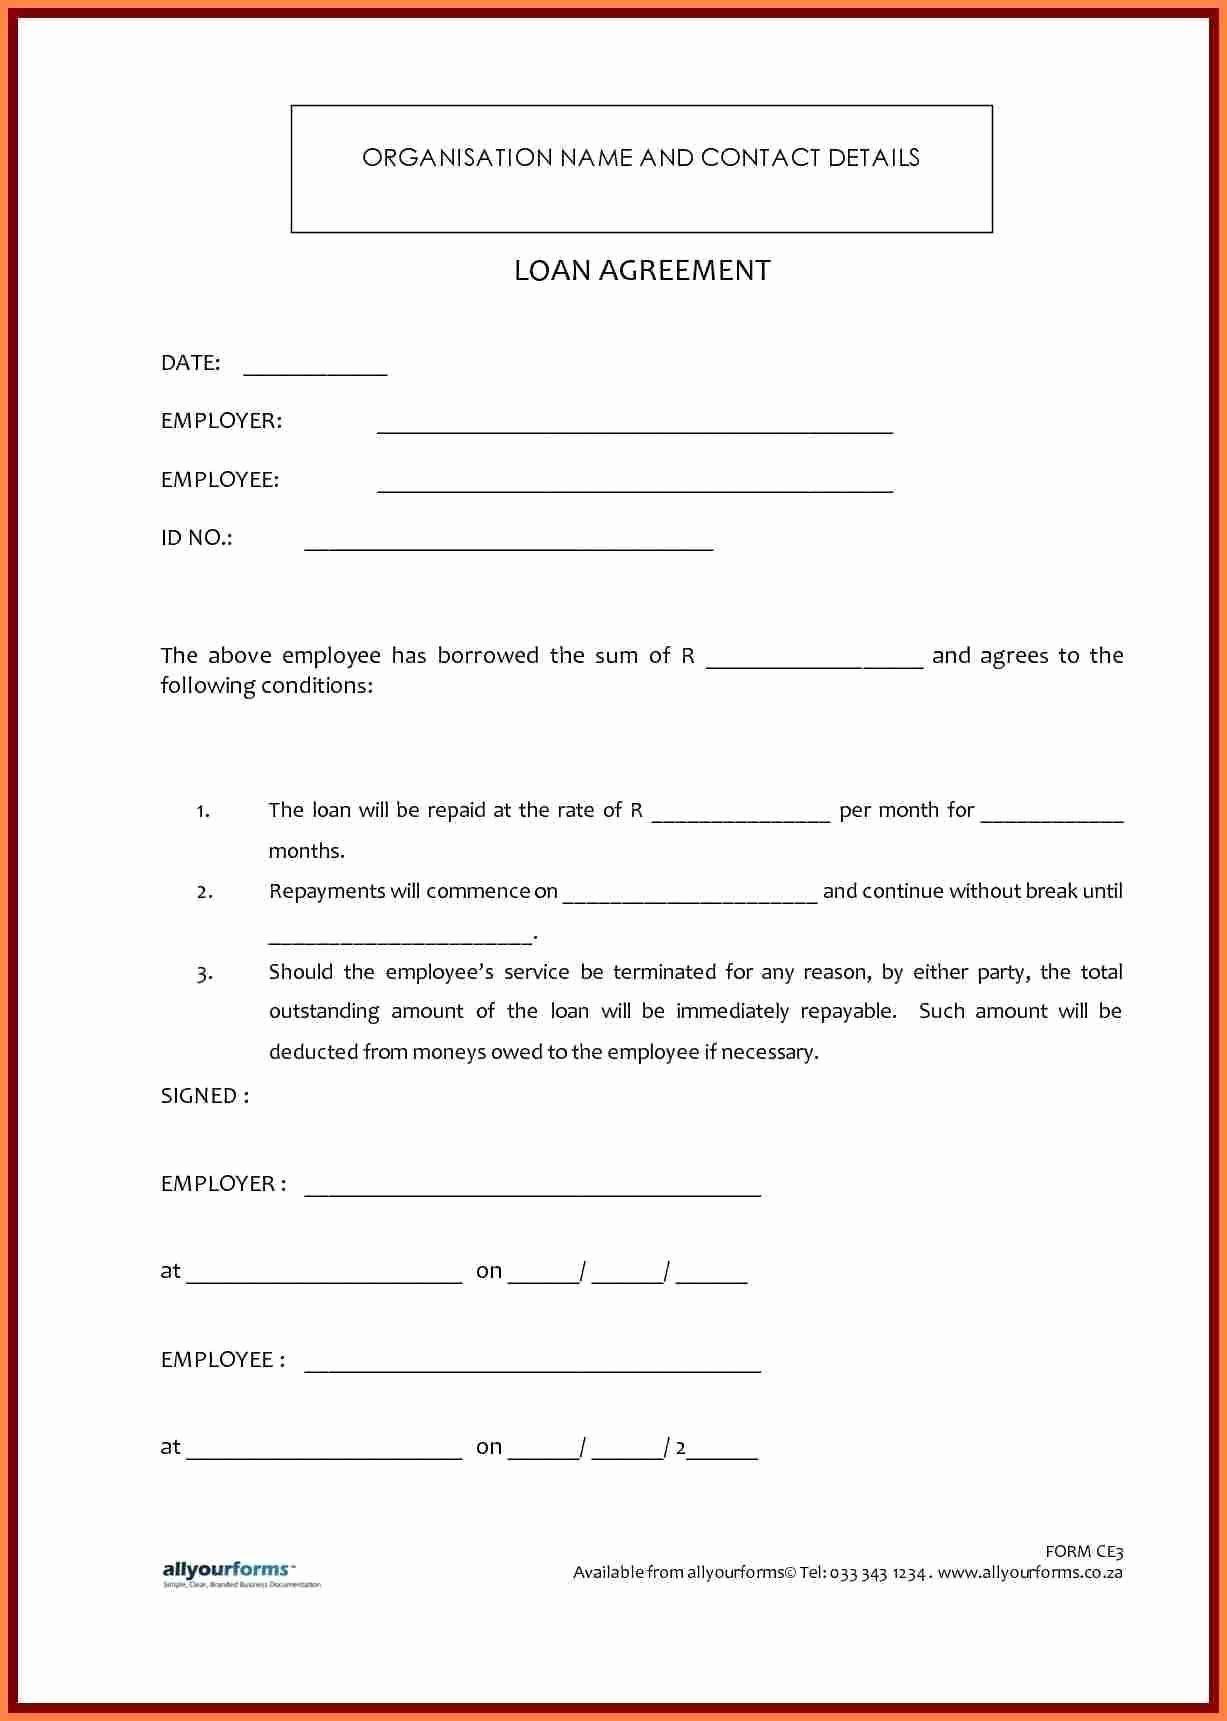 Family Loan Agreement Template Luxury 41 Last Sample Personal Loan Agreement Between Family Ga In 2020 Contract Template Personal Loans Loan